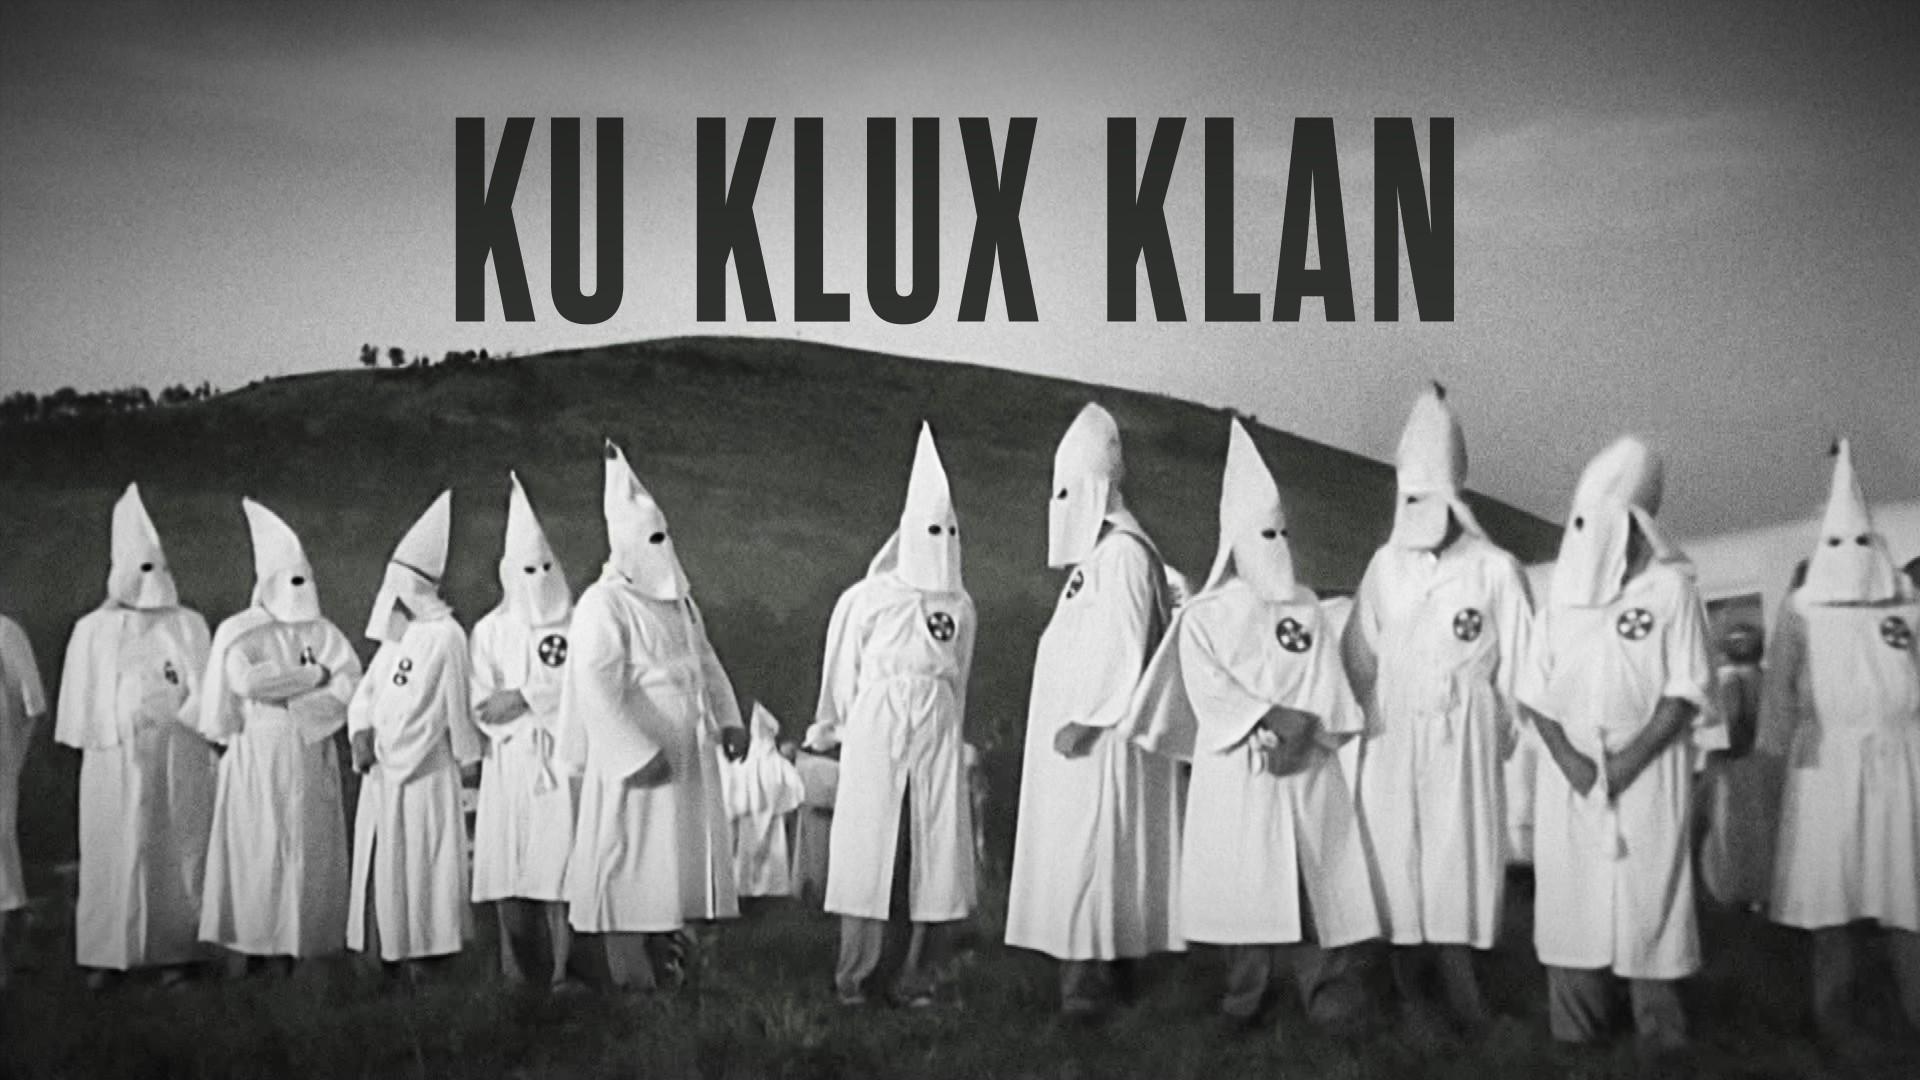 Ku Klux